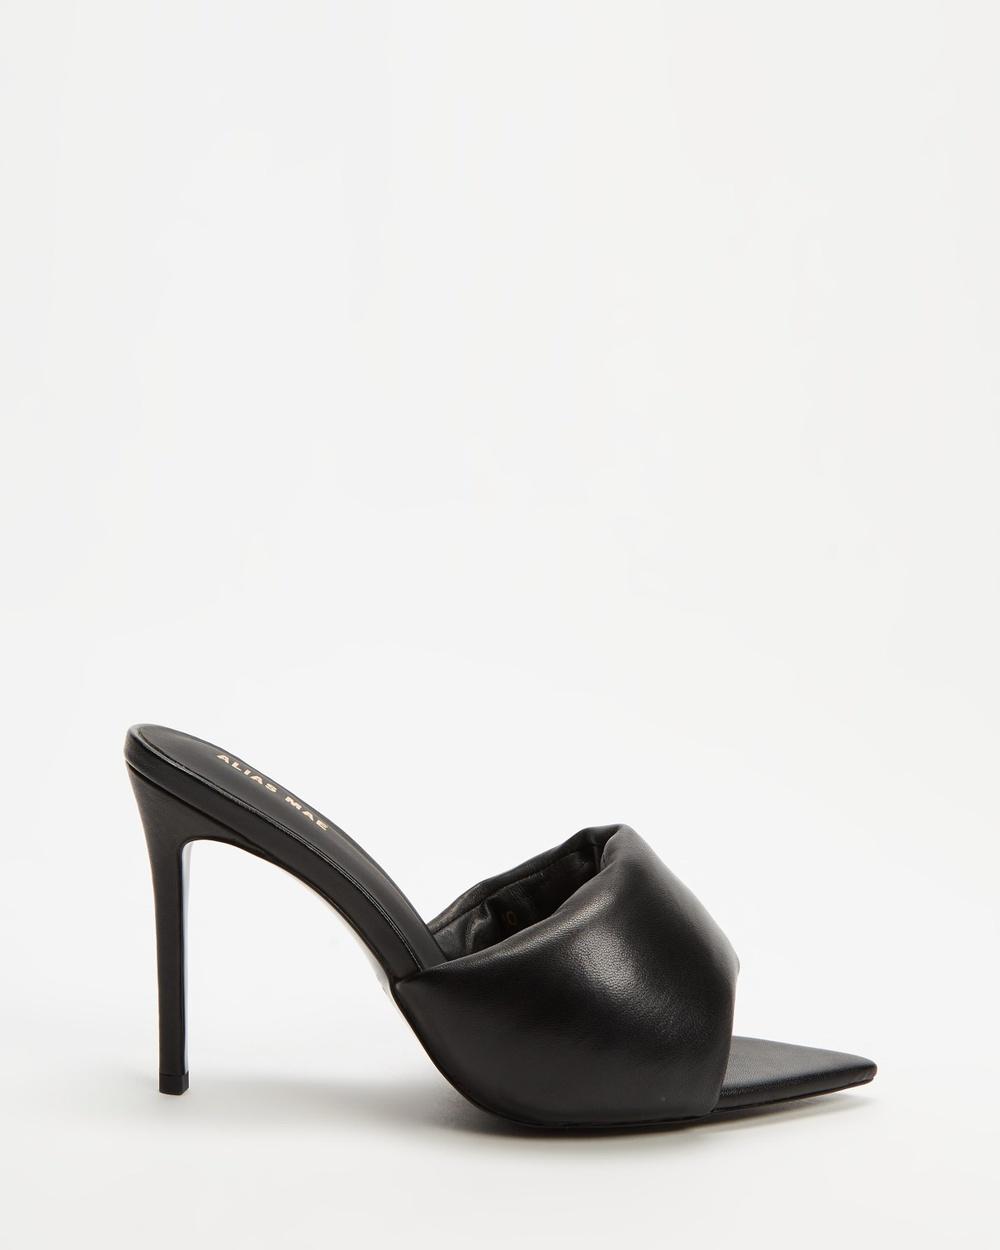 Alias Mae Dulce Heels Black Leather